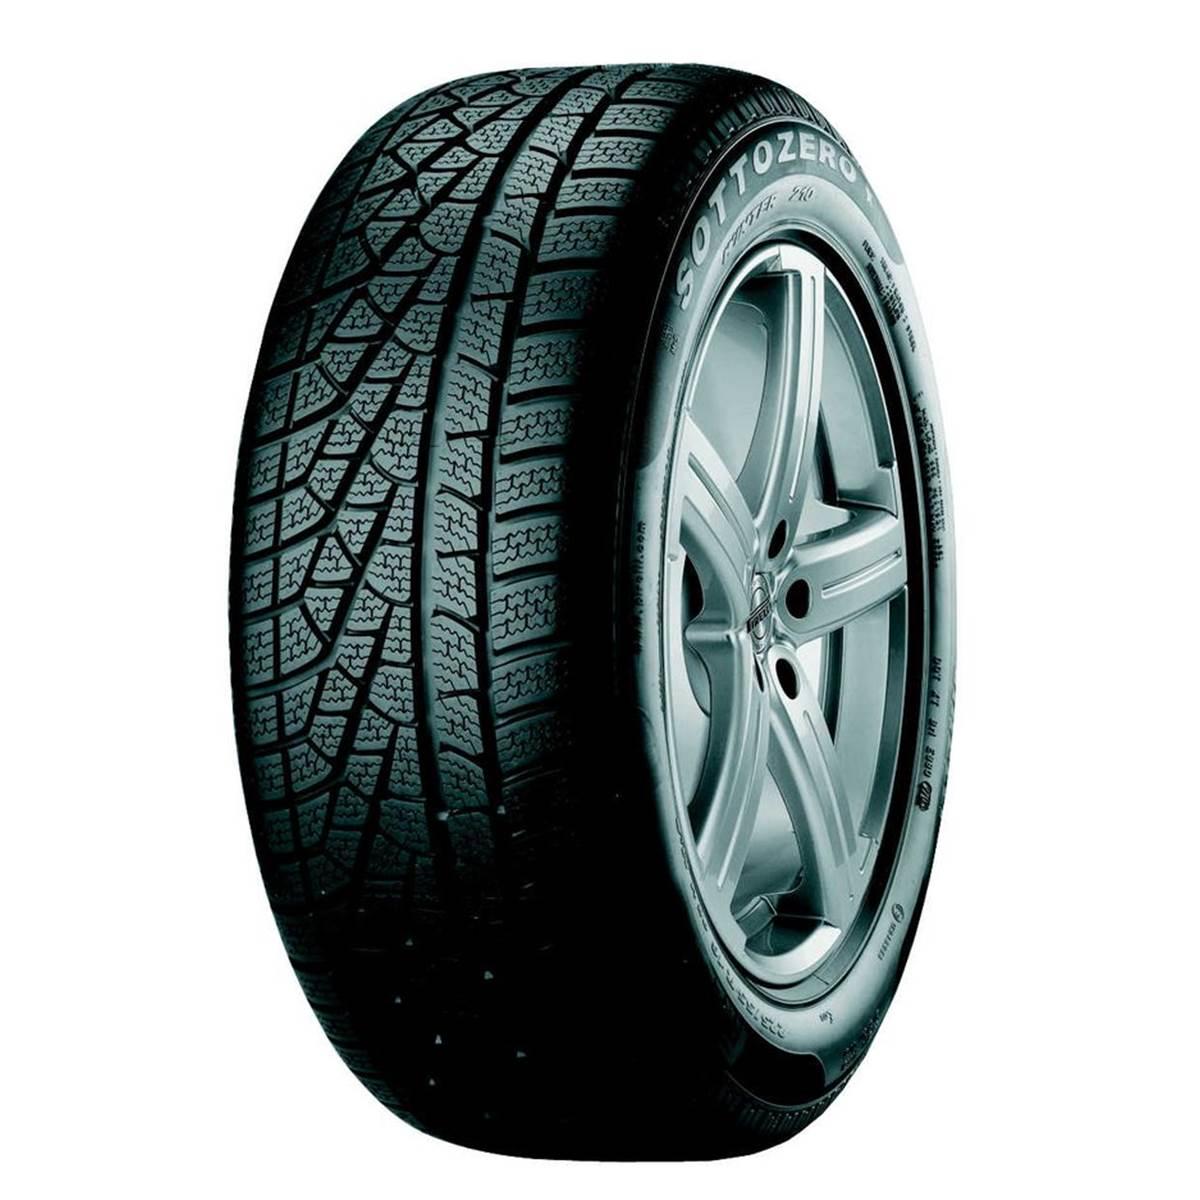 Pirelli Winter Sottozero 3 (*) Runflat